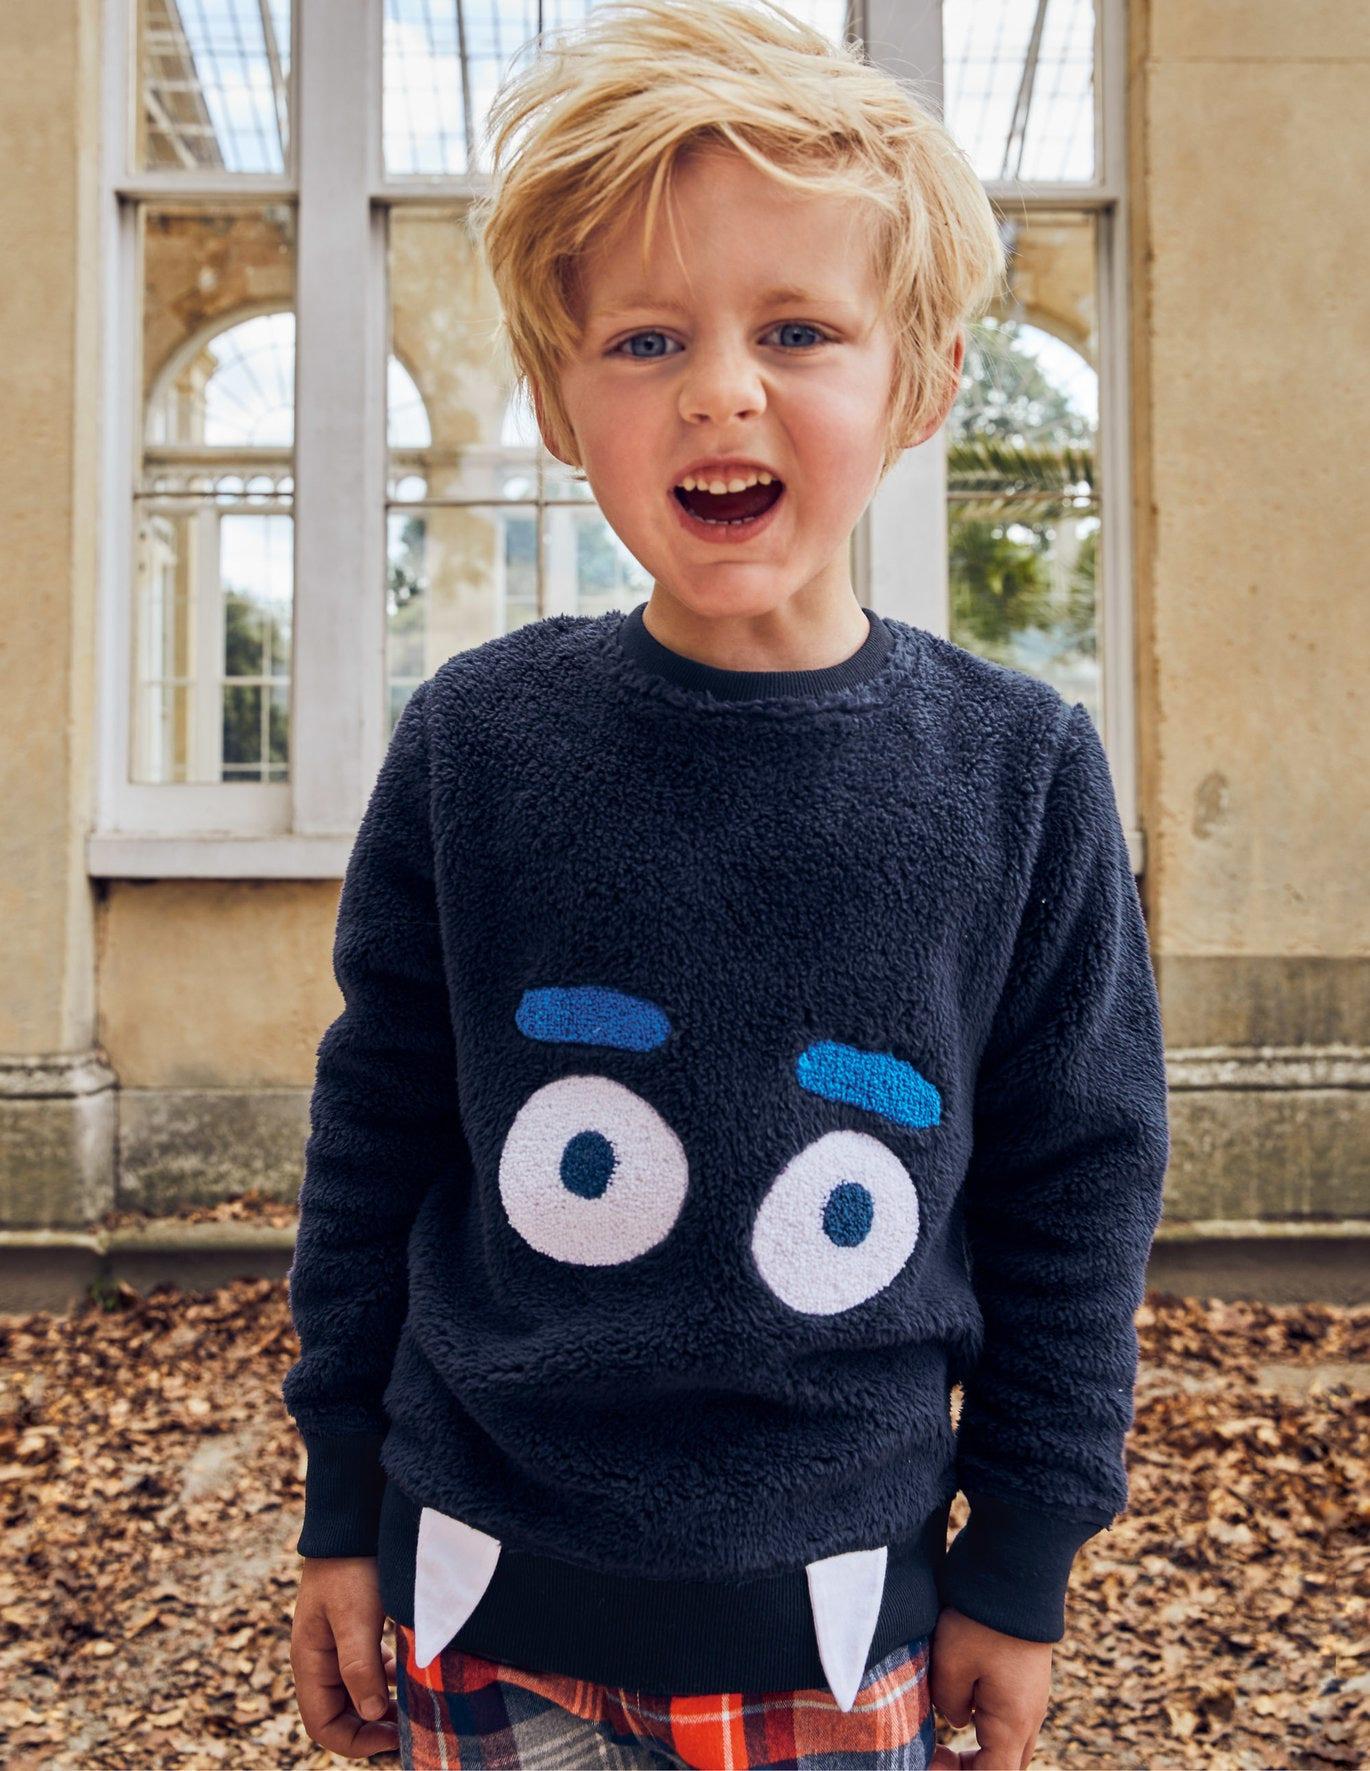 Snuggly Monster Sweatshirt - Navy Blue Monster